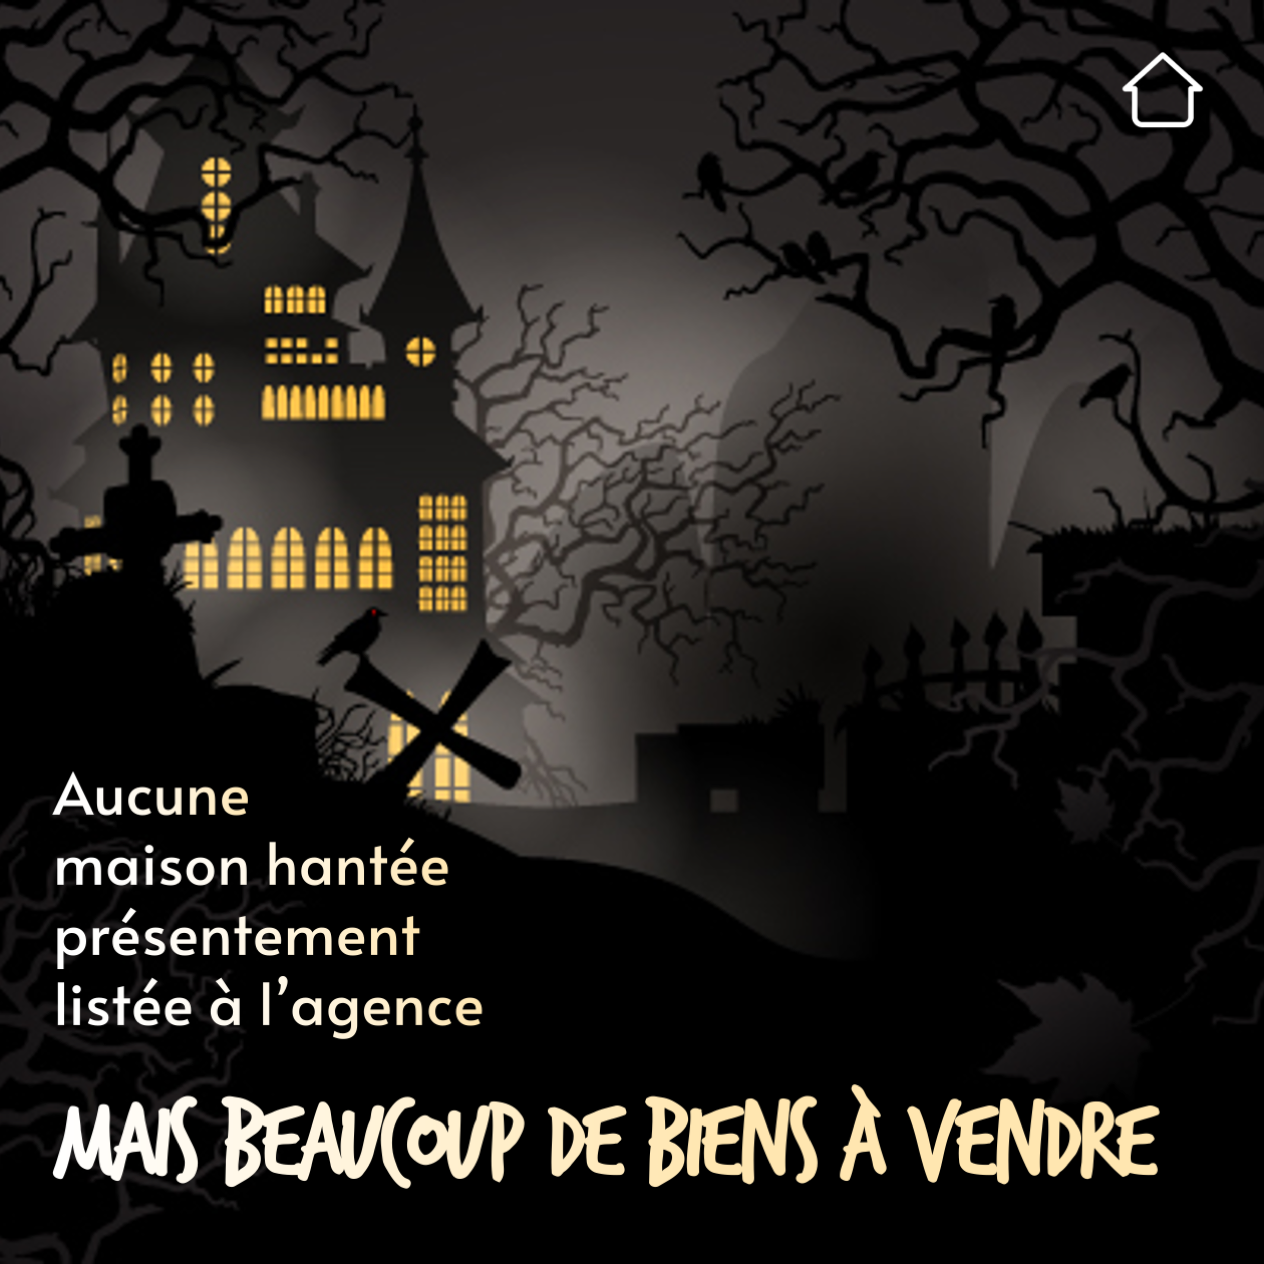 Biens A Vendre Halloween Maisons Hantees